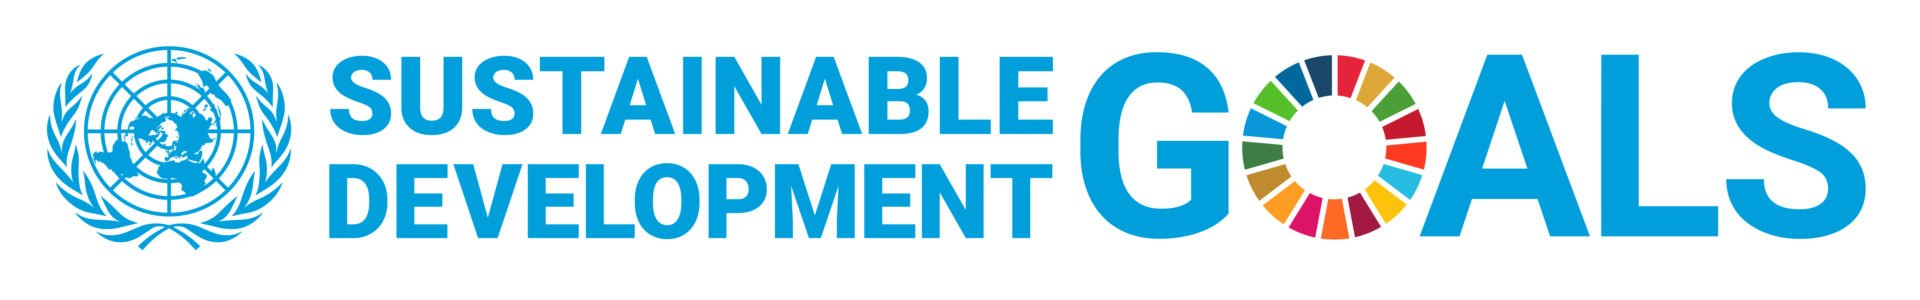 E_SDG_logo_UN_emblem_horizontal_WEB